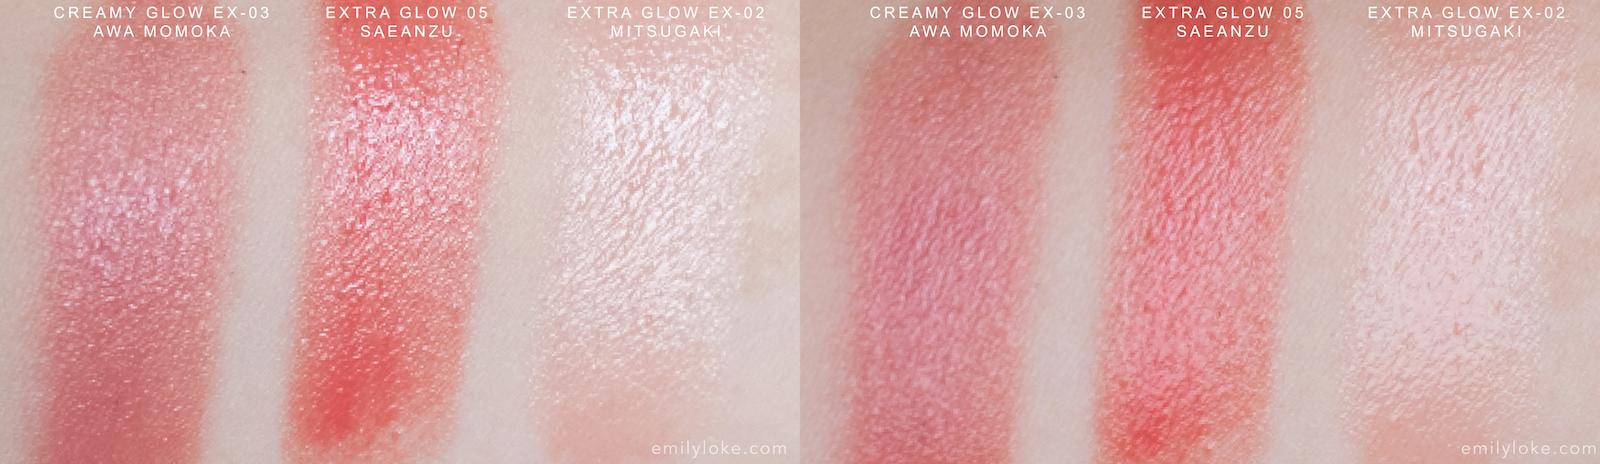 SUQQU extra glow lipstick swatches 02